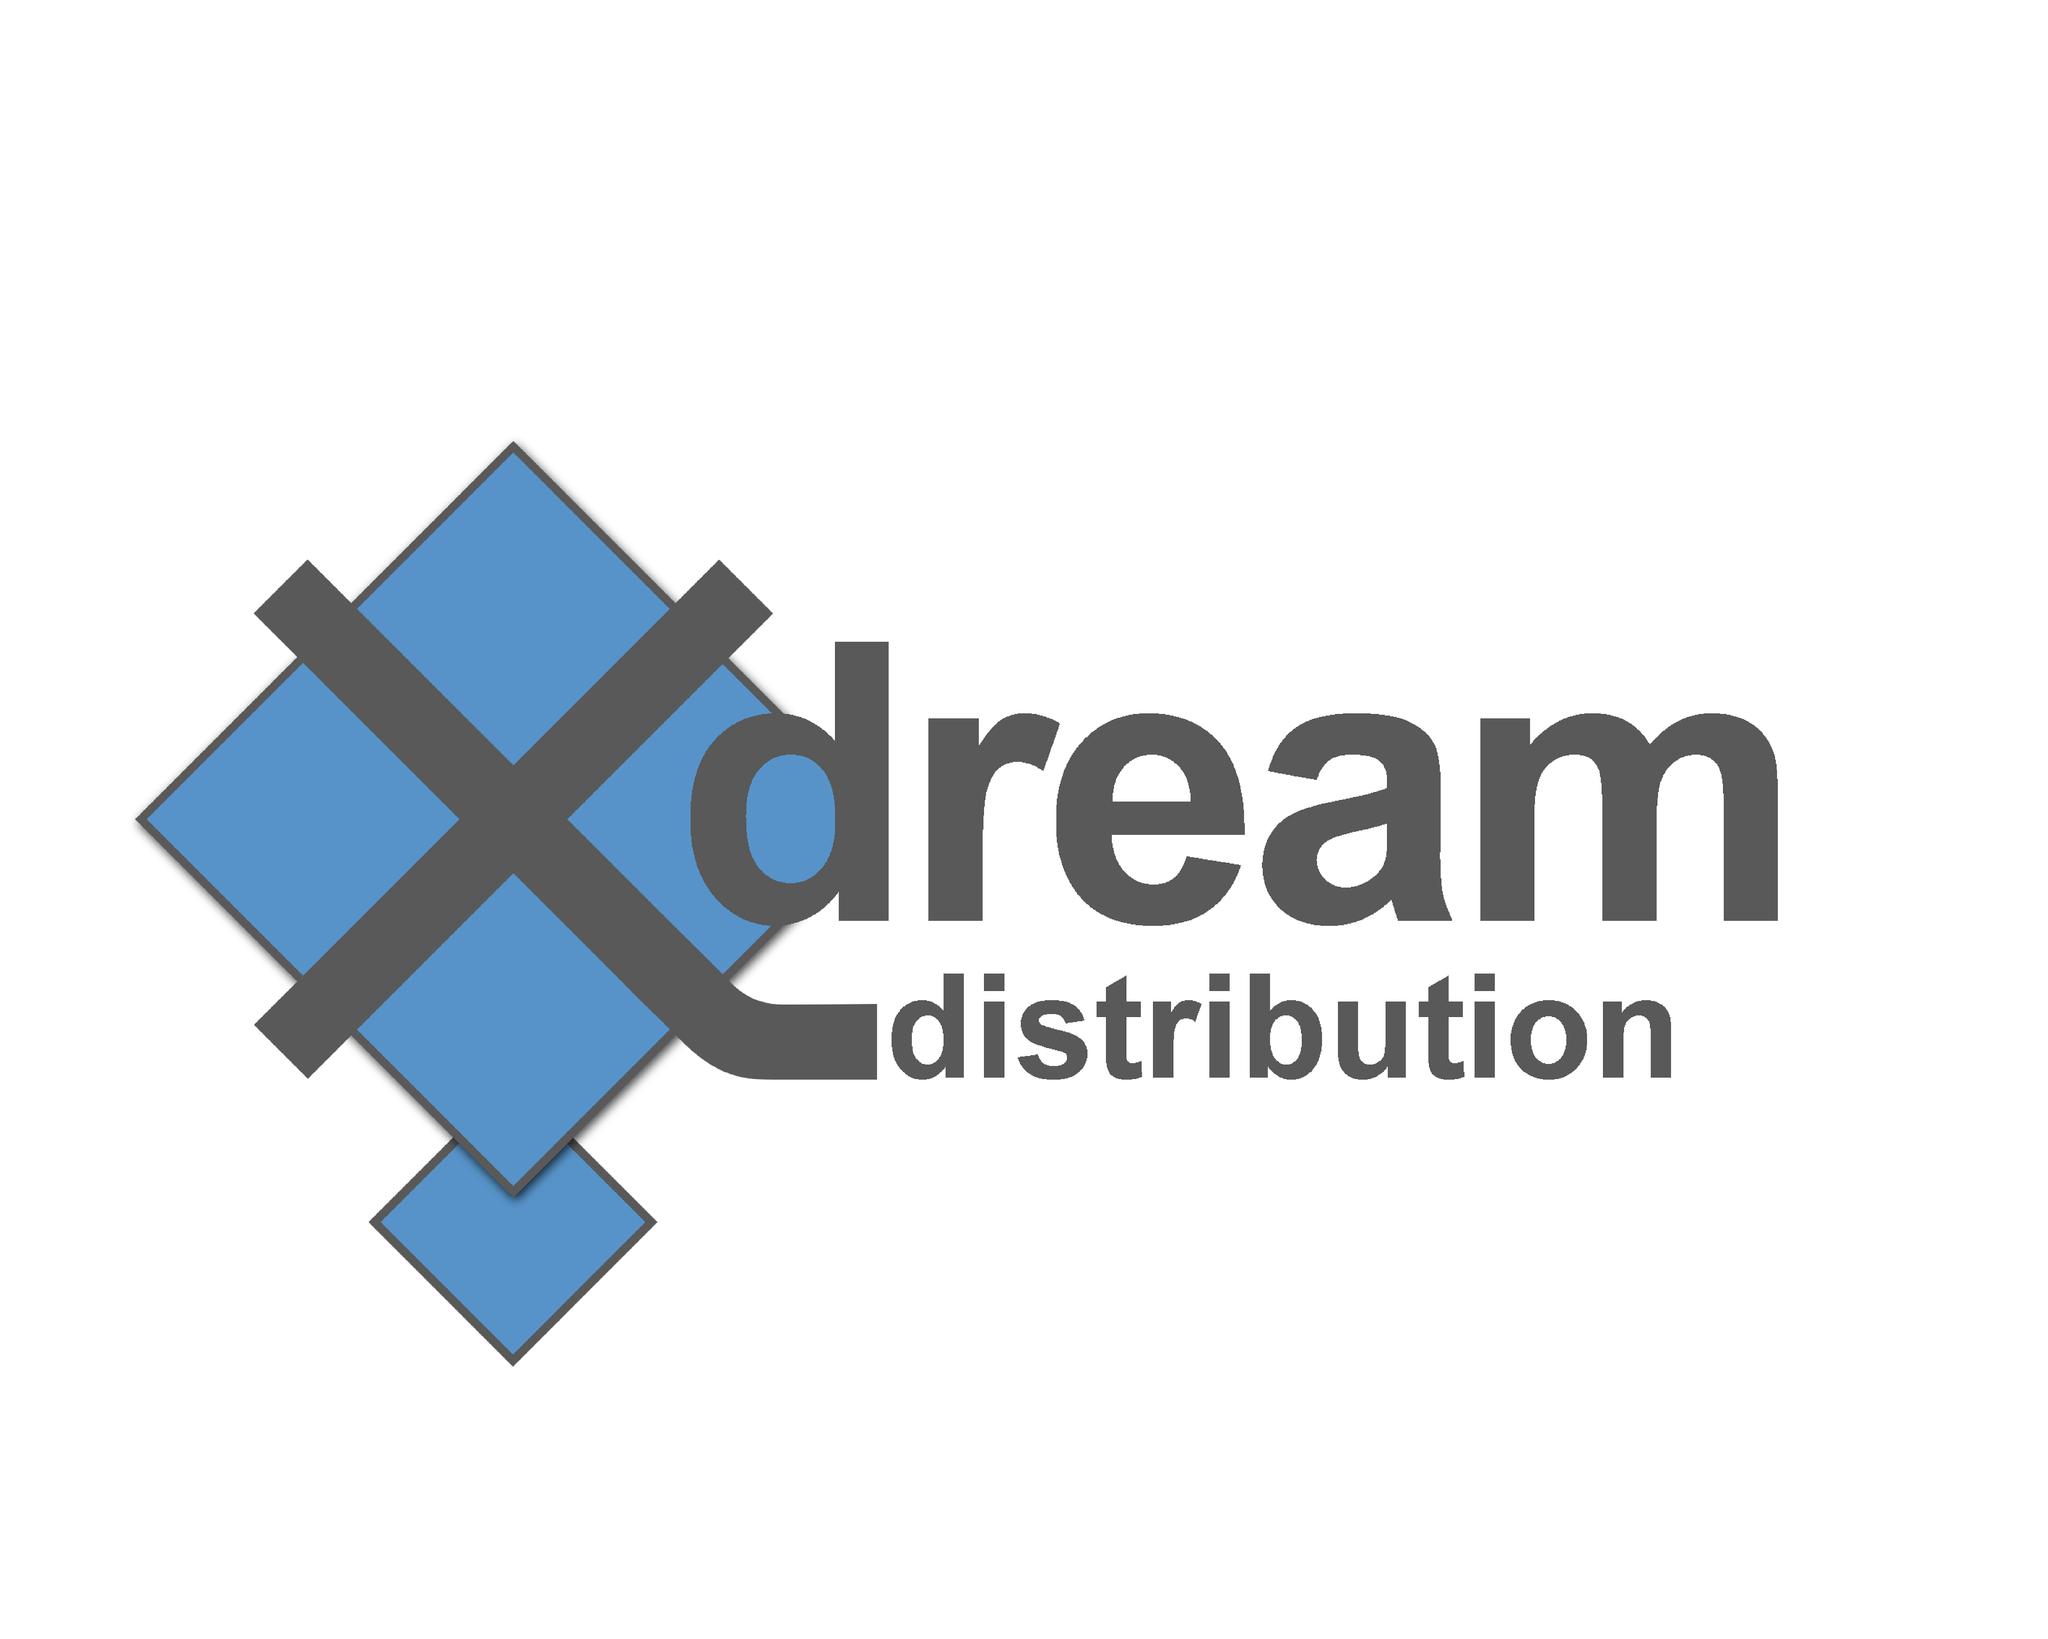 X-dream-distribution GmbH